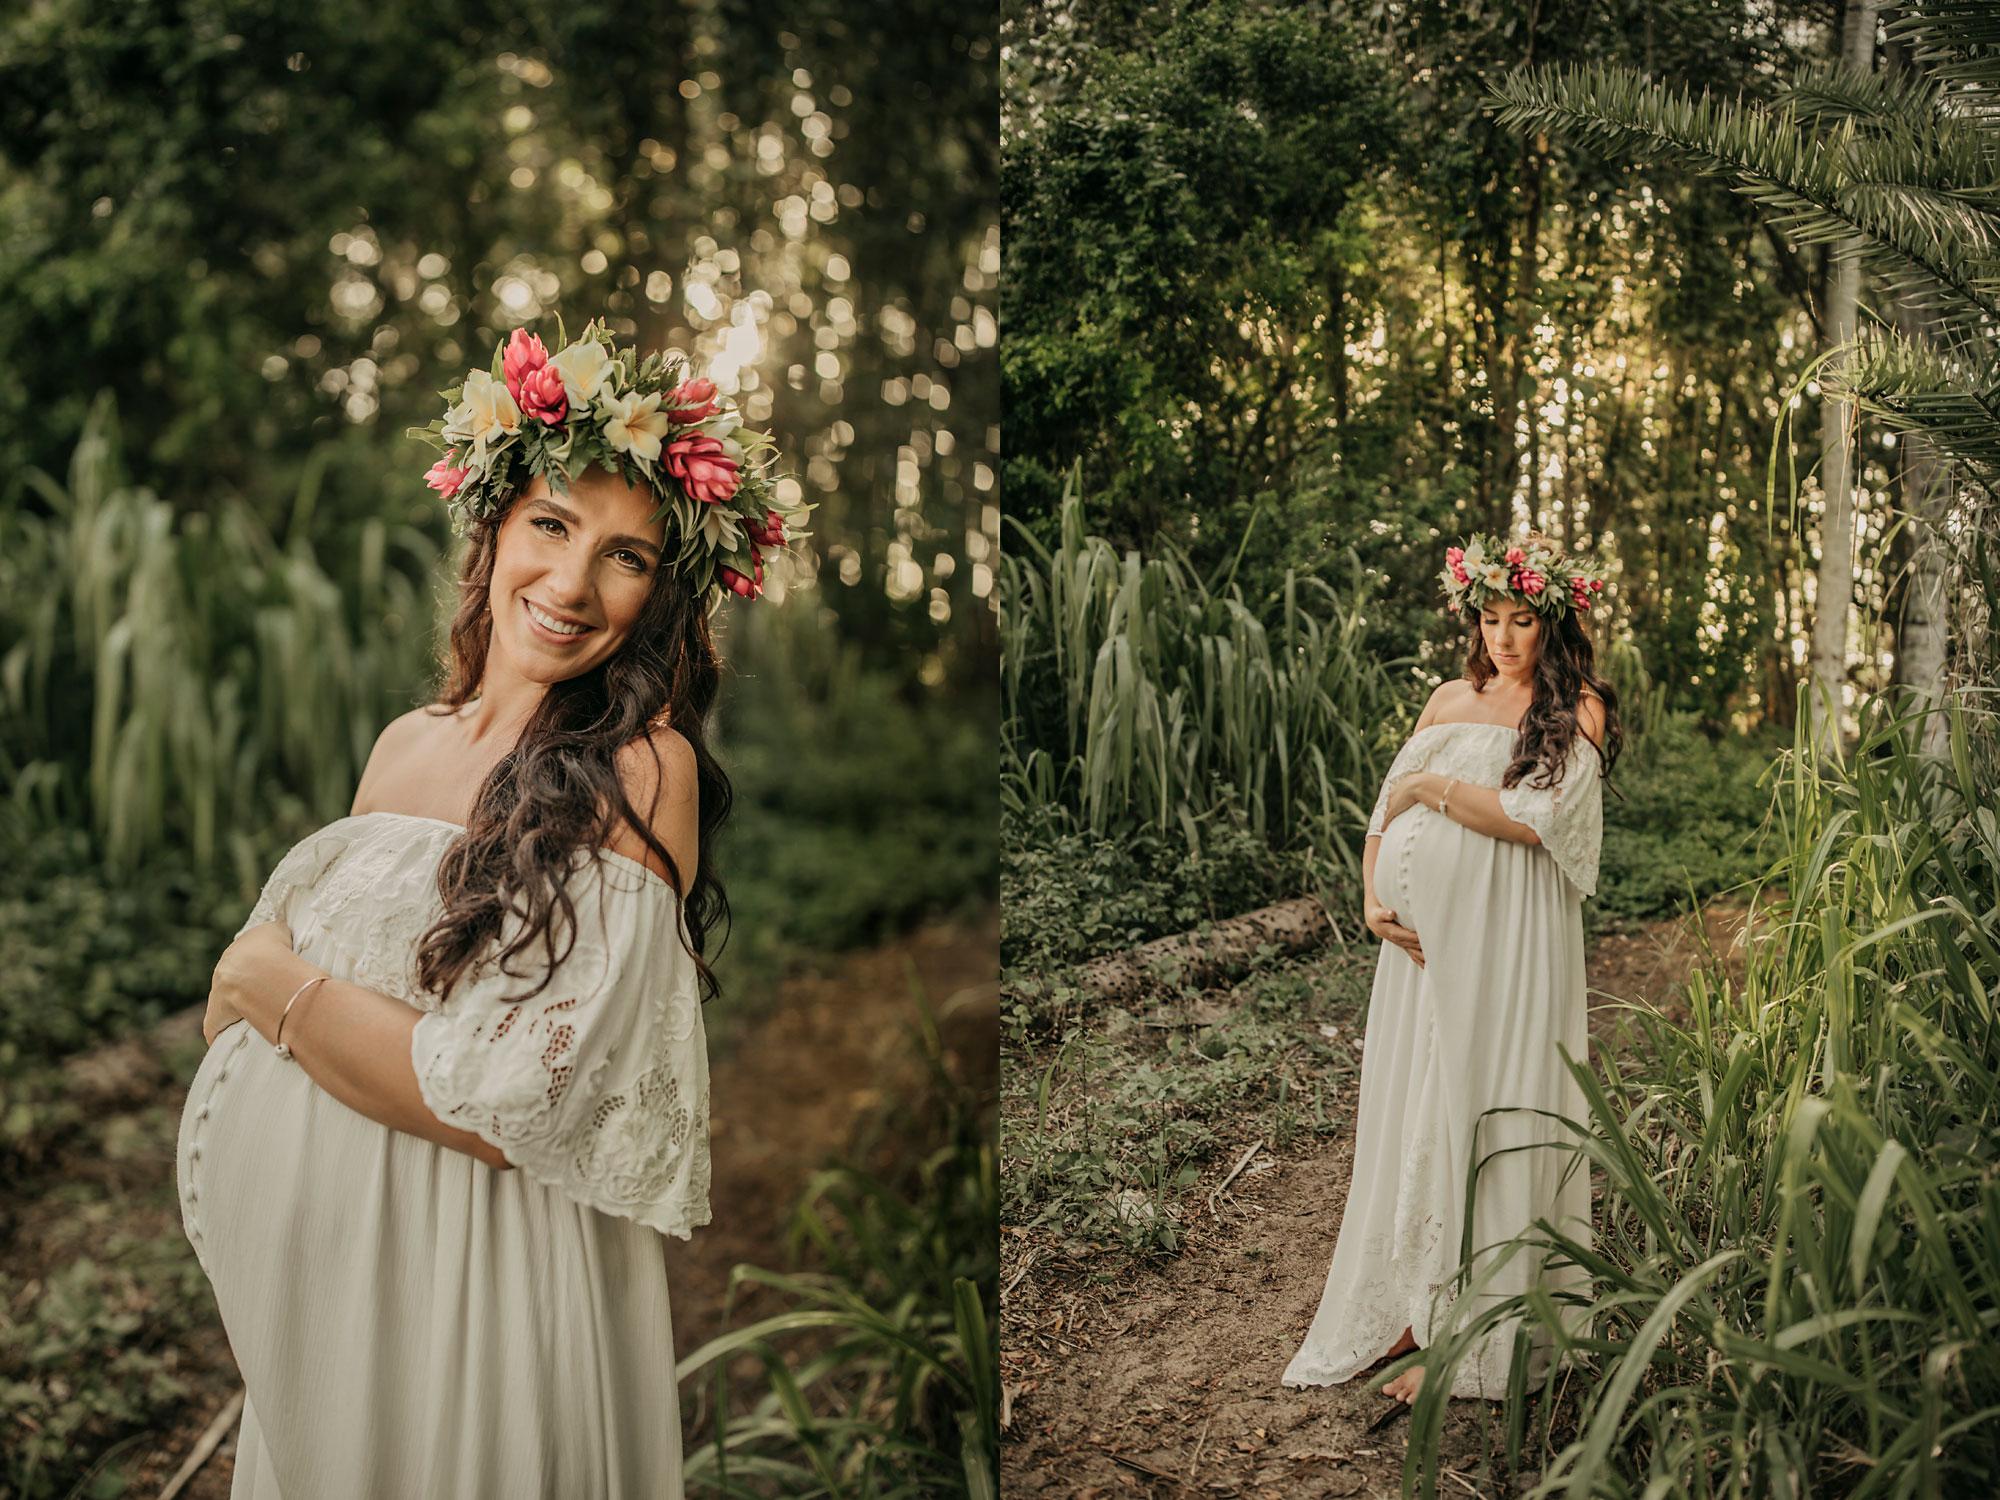 Hawaii-Oahu-Maternity-Photography-The-Sophia-Co-001.jpg